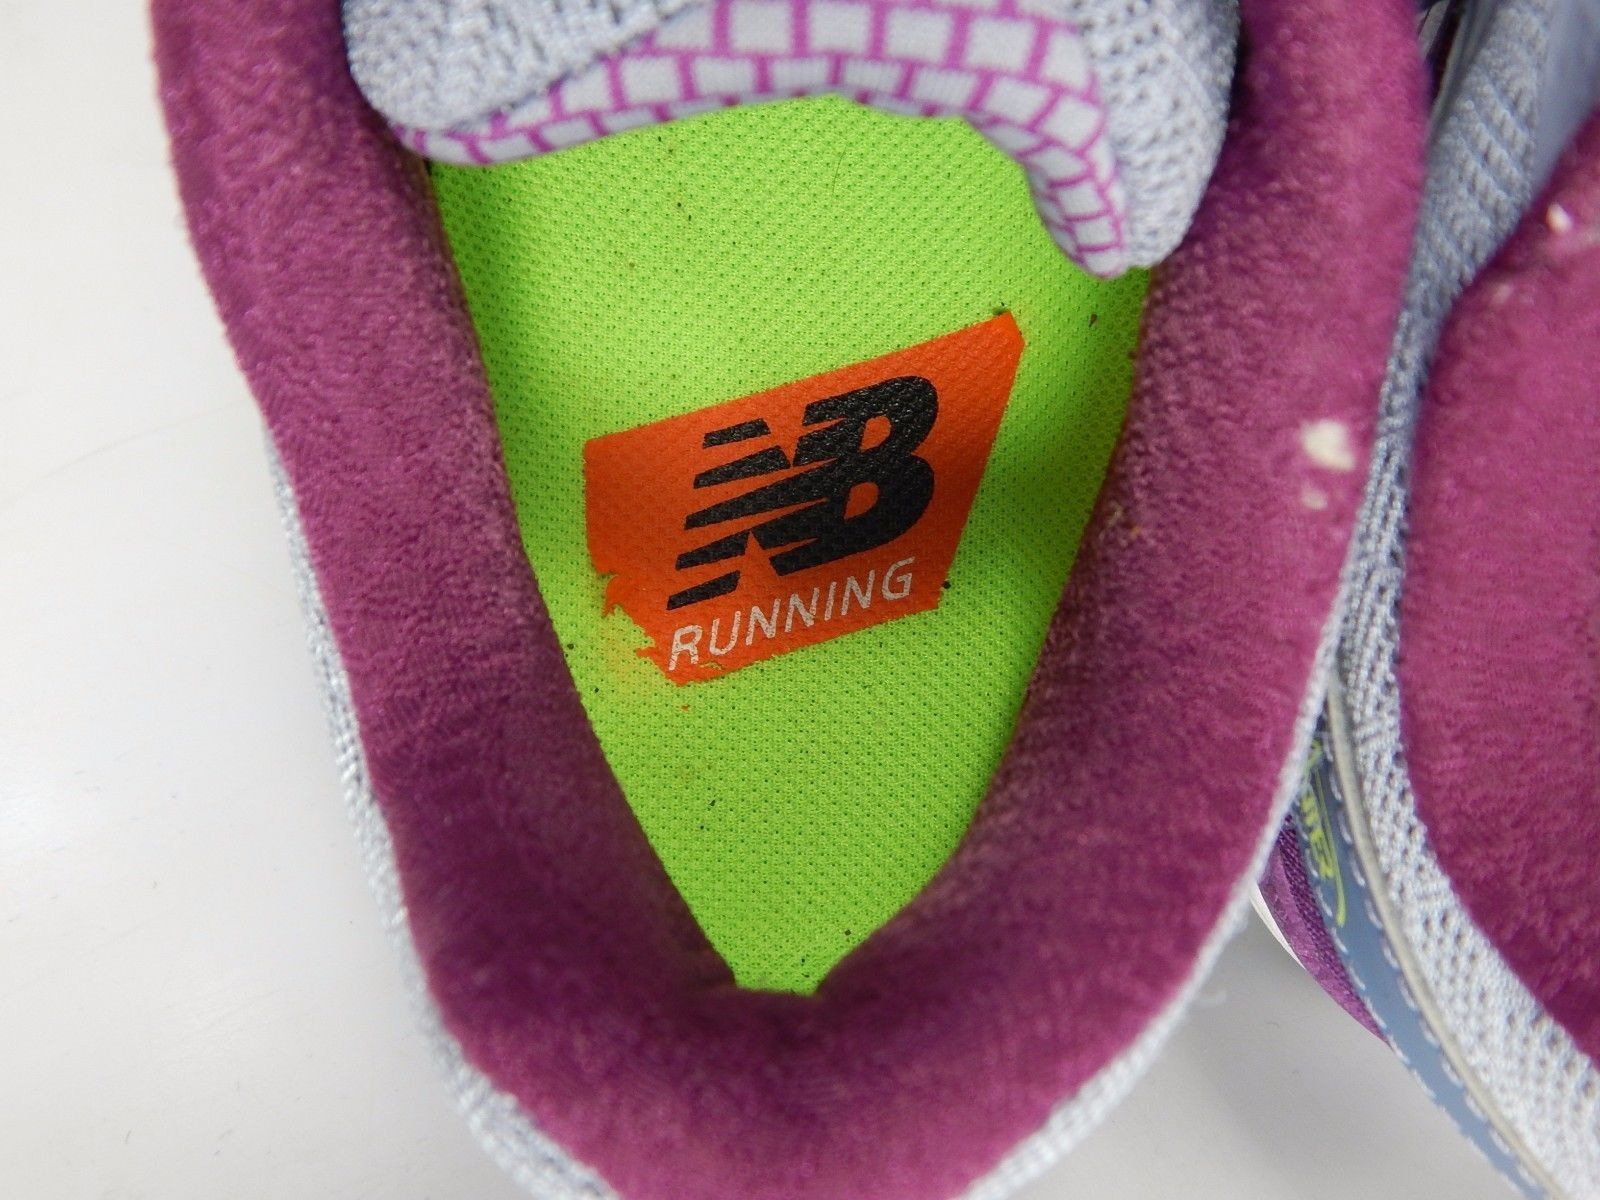 New Balance 880 v5 Women's Running Shoes Size US 6.5 M (B) EU 37 Purple W880PP5